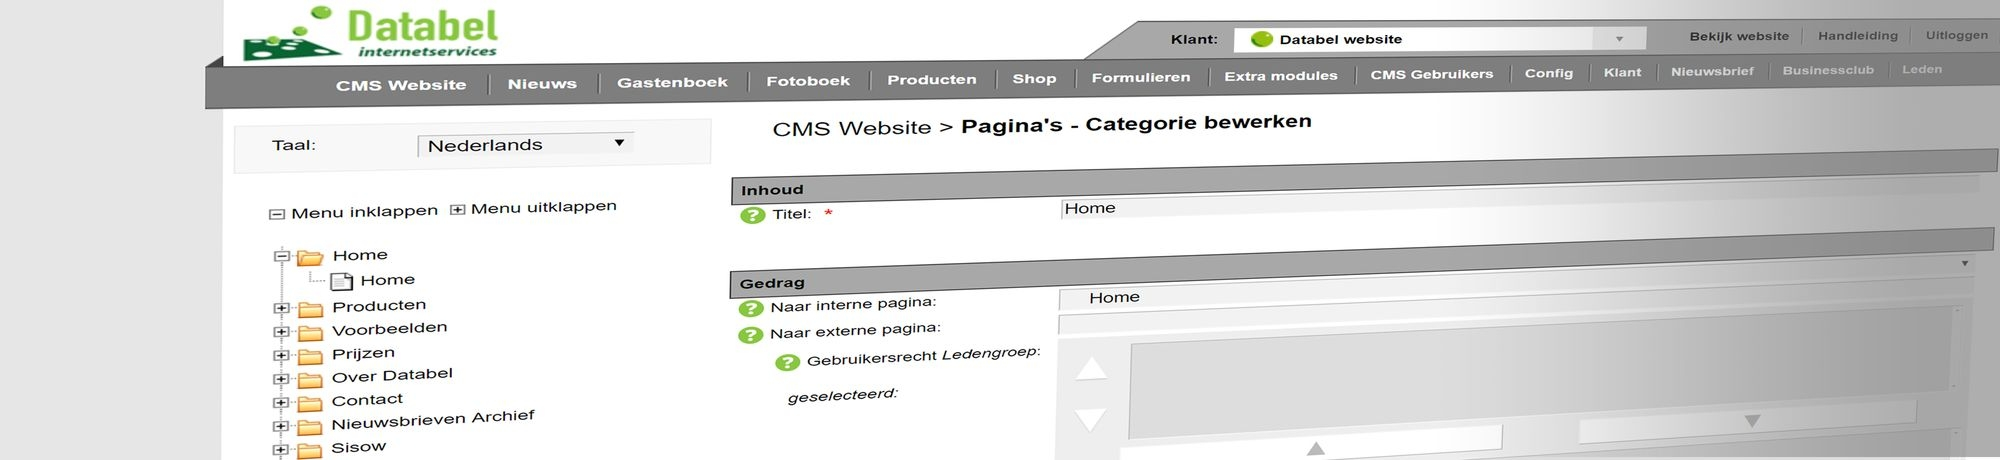 Databel CMS